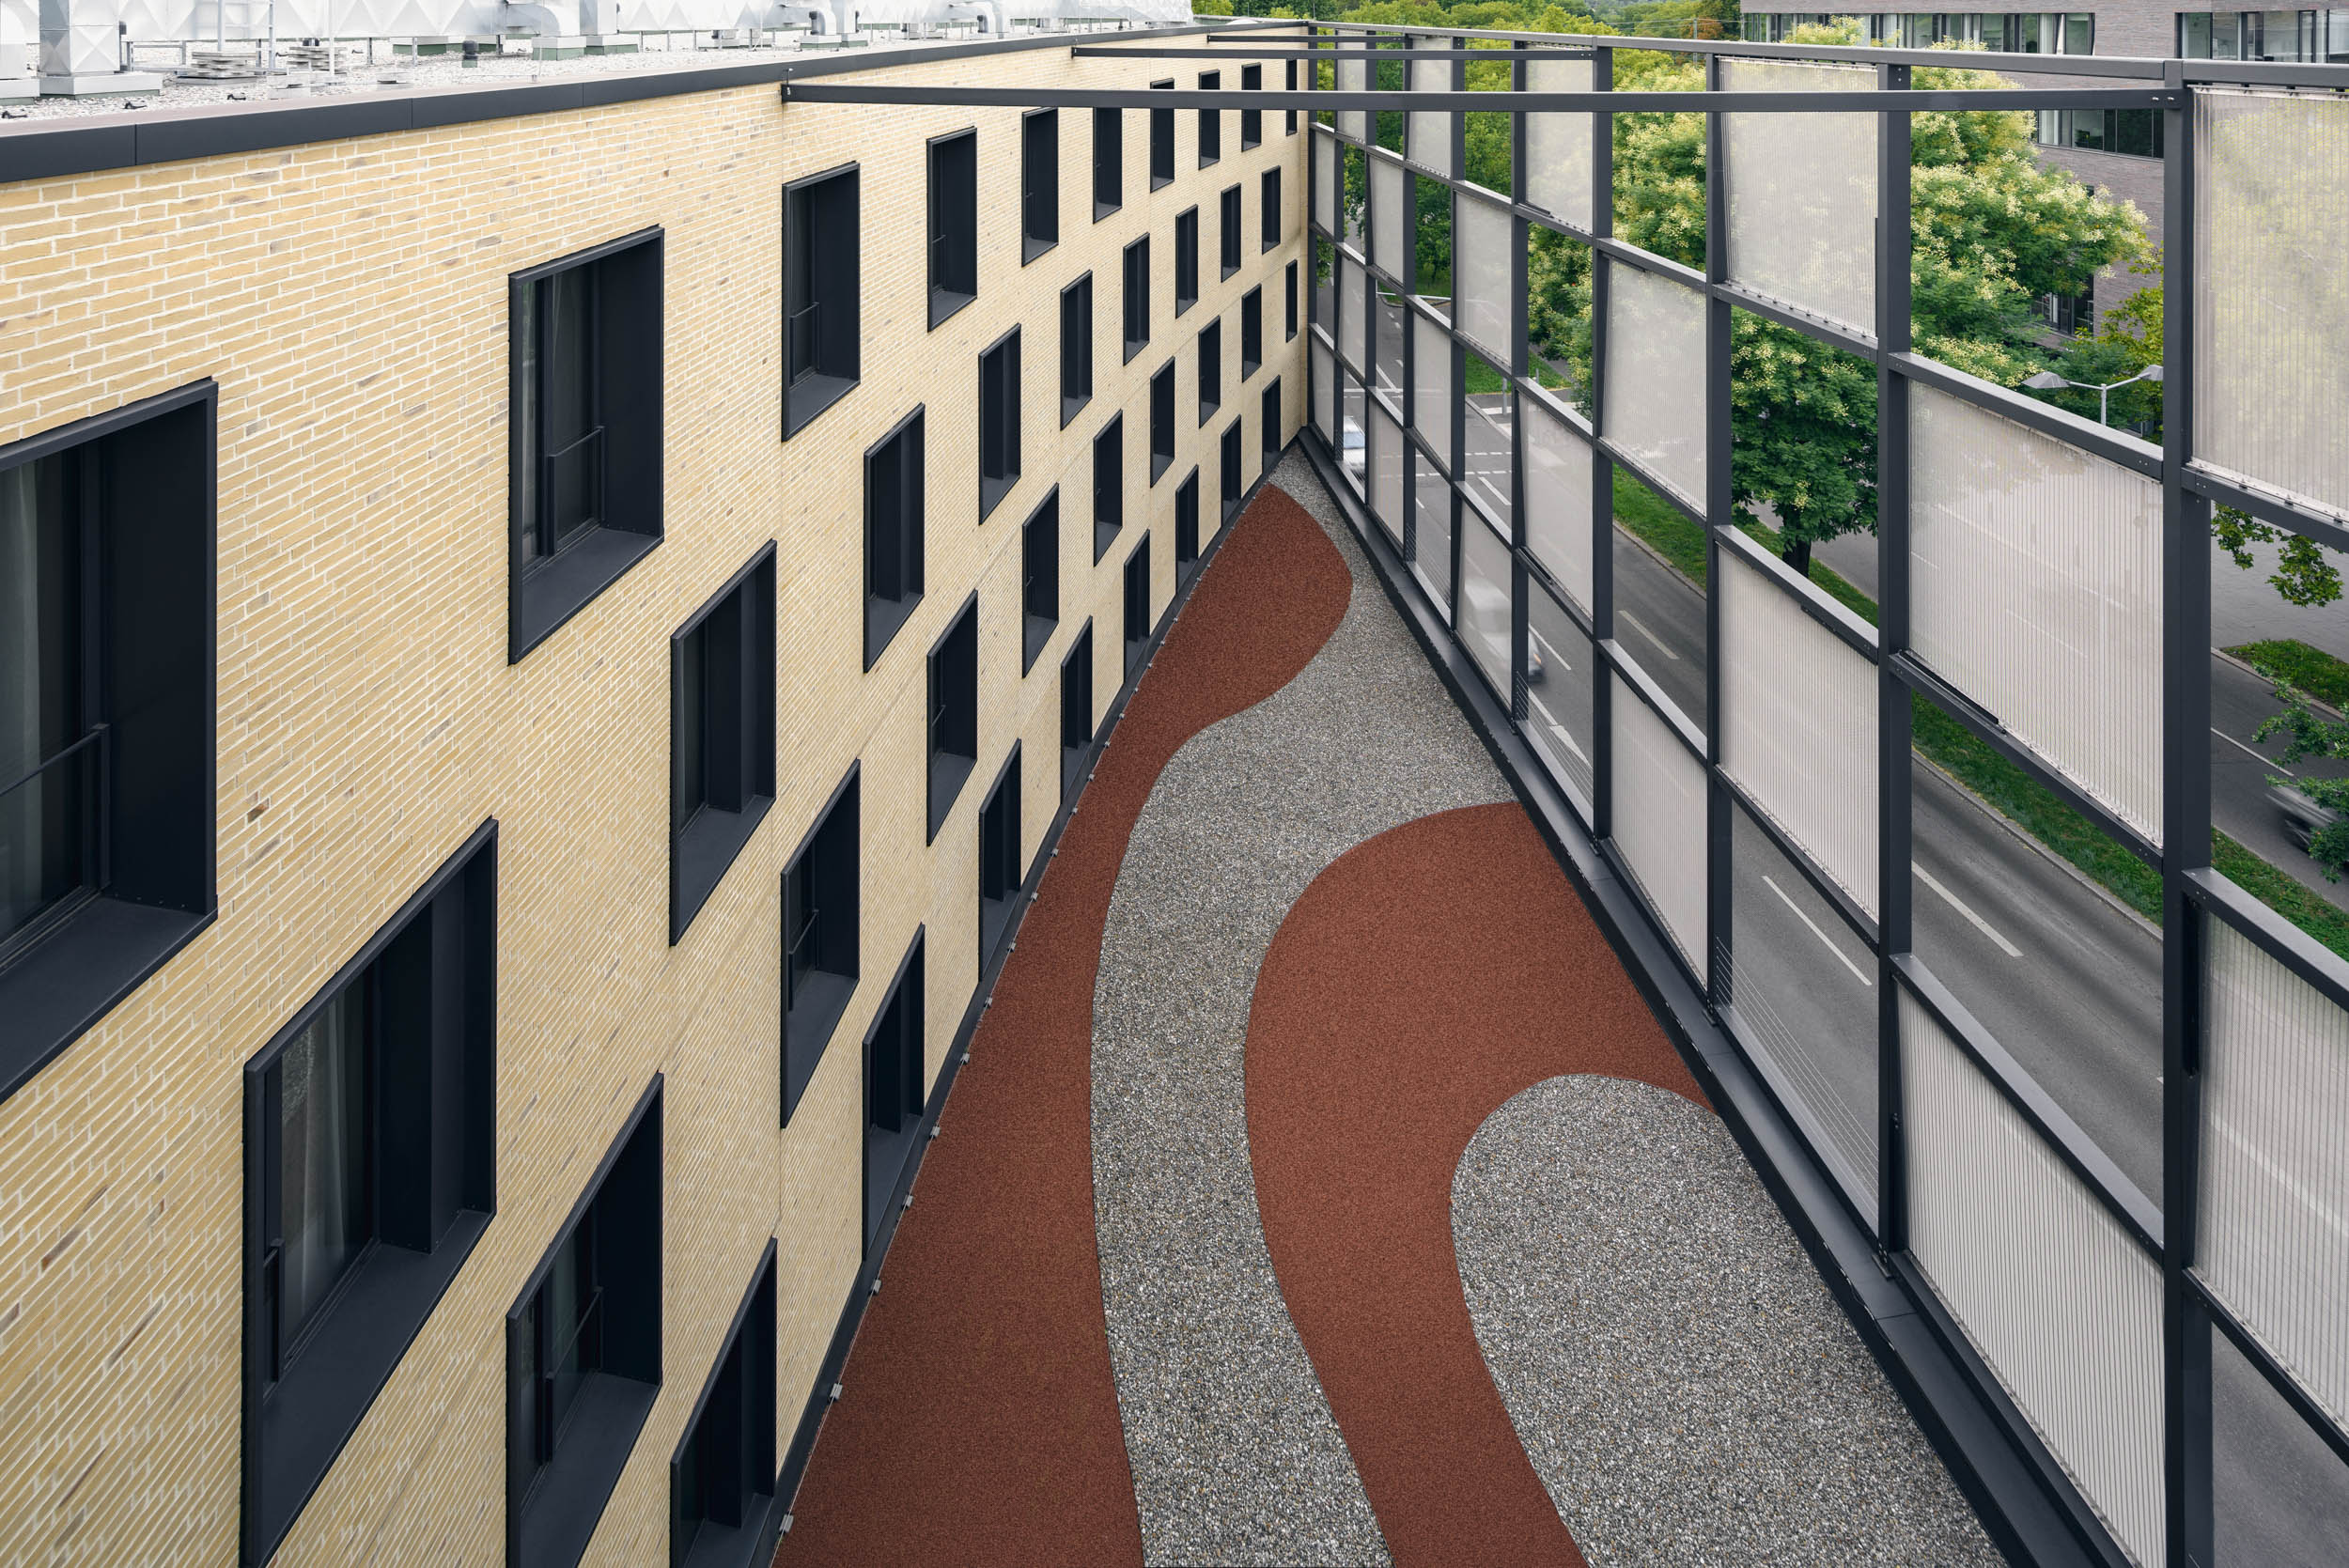 Gustav-Epple-Bauunternehmung-Hotel-Mercure-Heilbronn-MLX5394